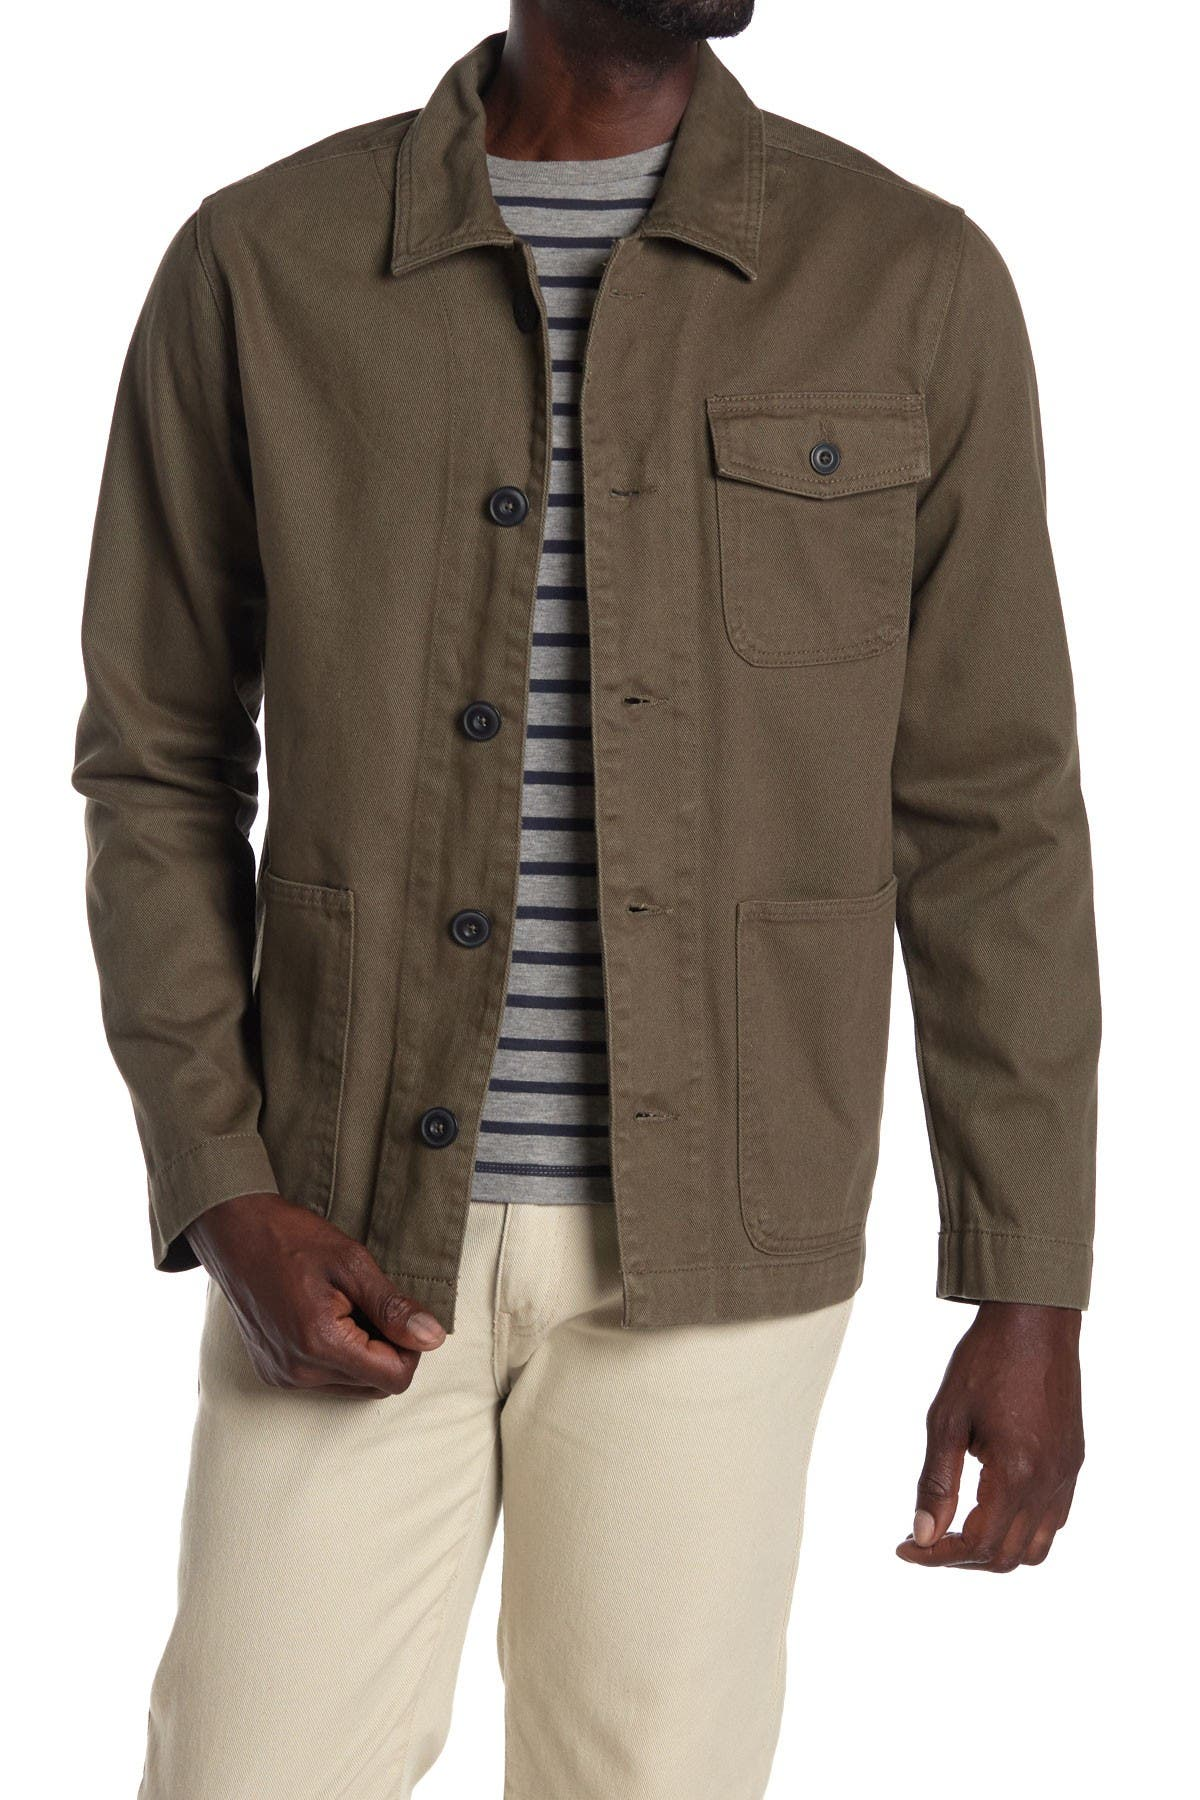 Image of Slate & Stone Cotton Work Wear Jacket